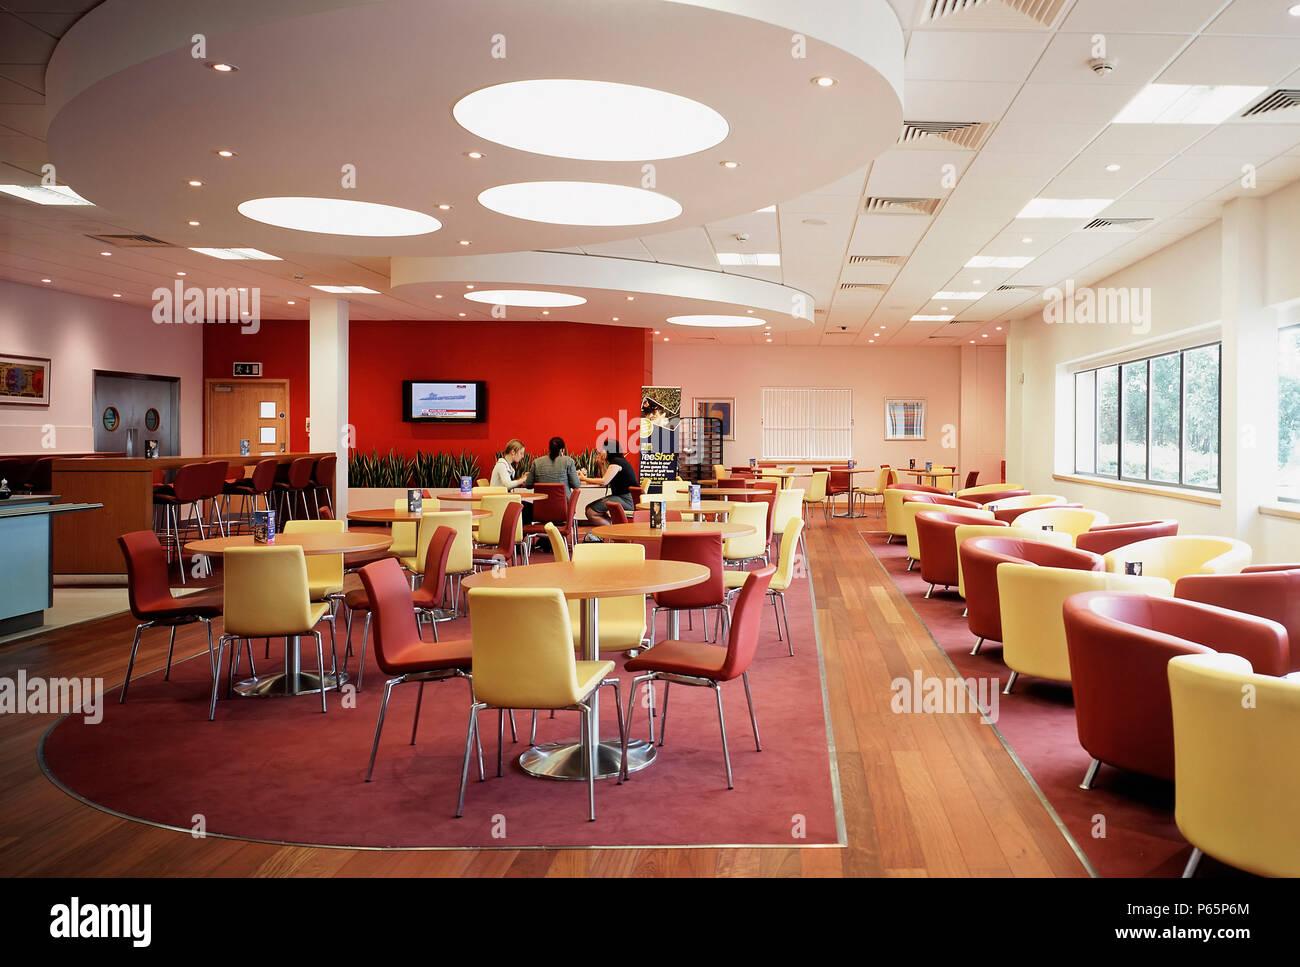 Buro Cafe Und Lounge Stockfoto Bild 210339548 Alamy